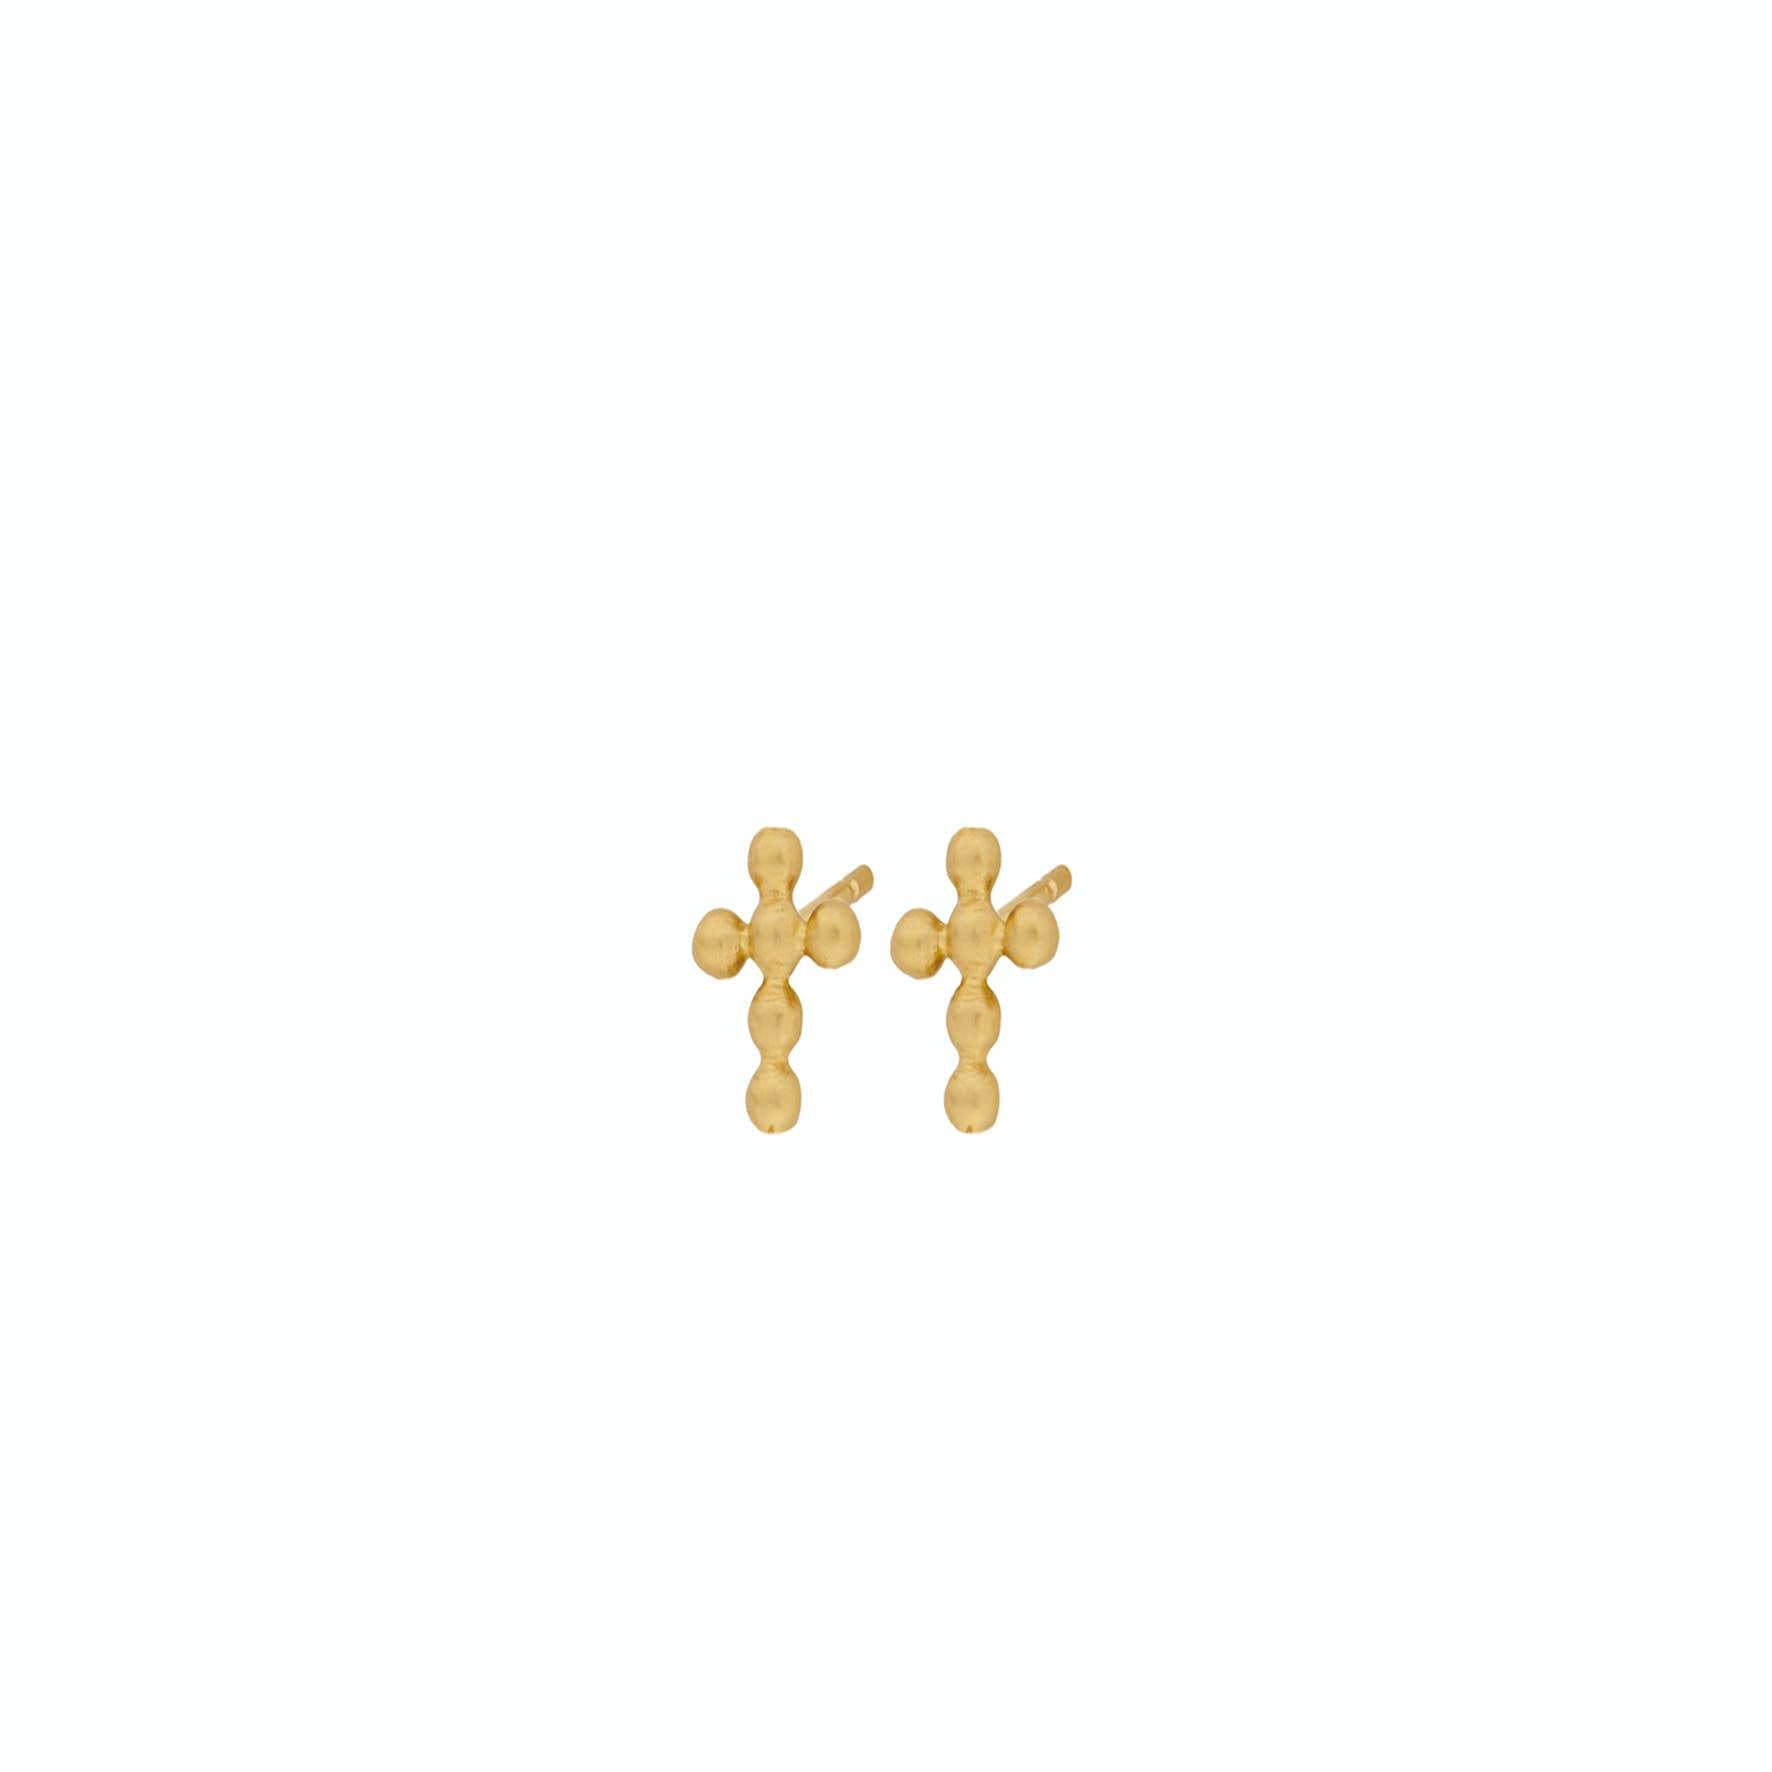 Cross Earsticks from Pernille Corydon in Goldplated-Silver Sterling 925